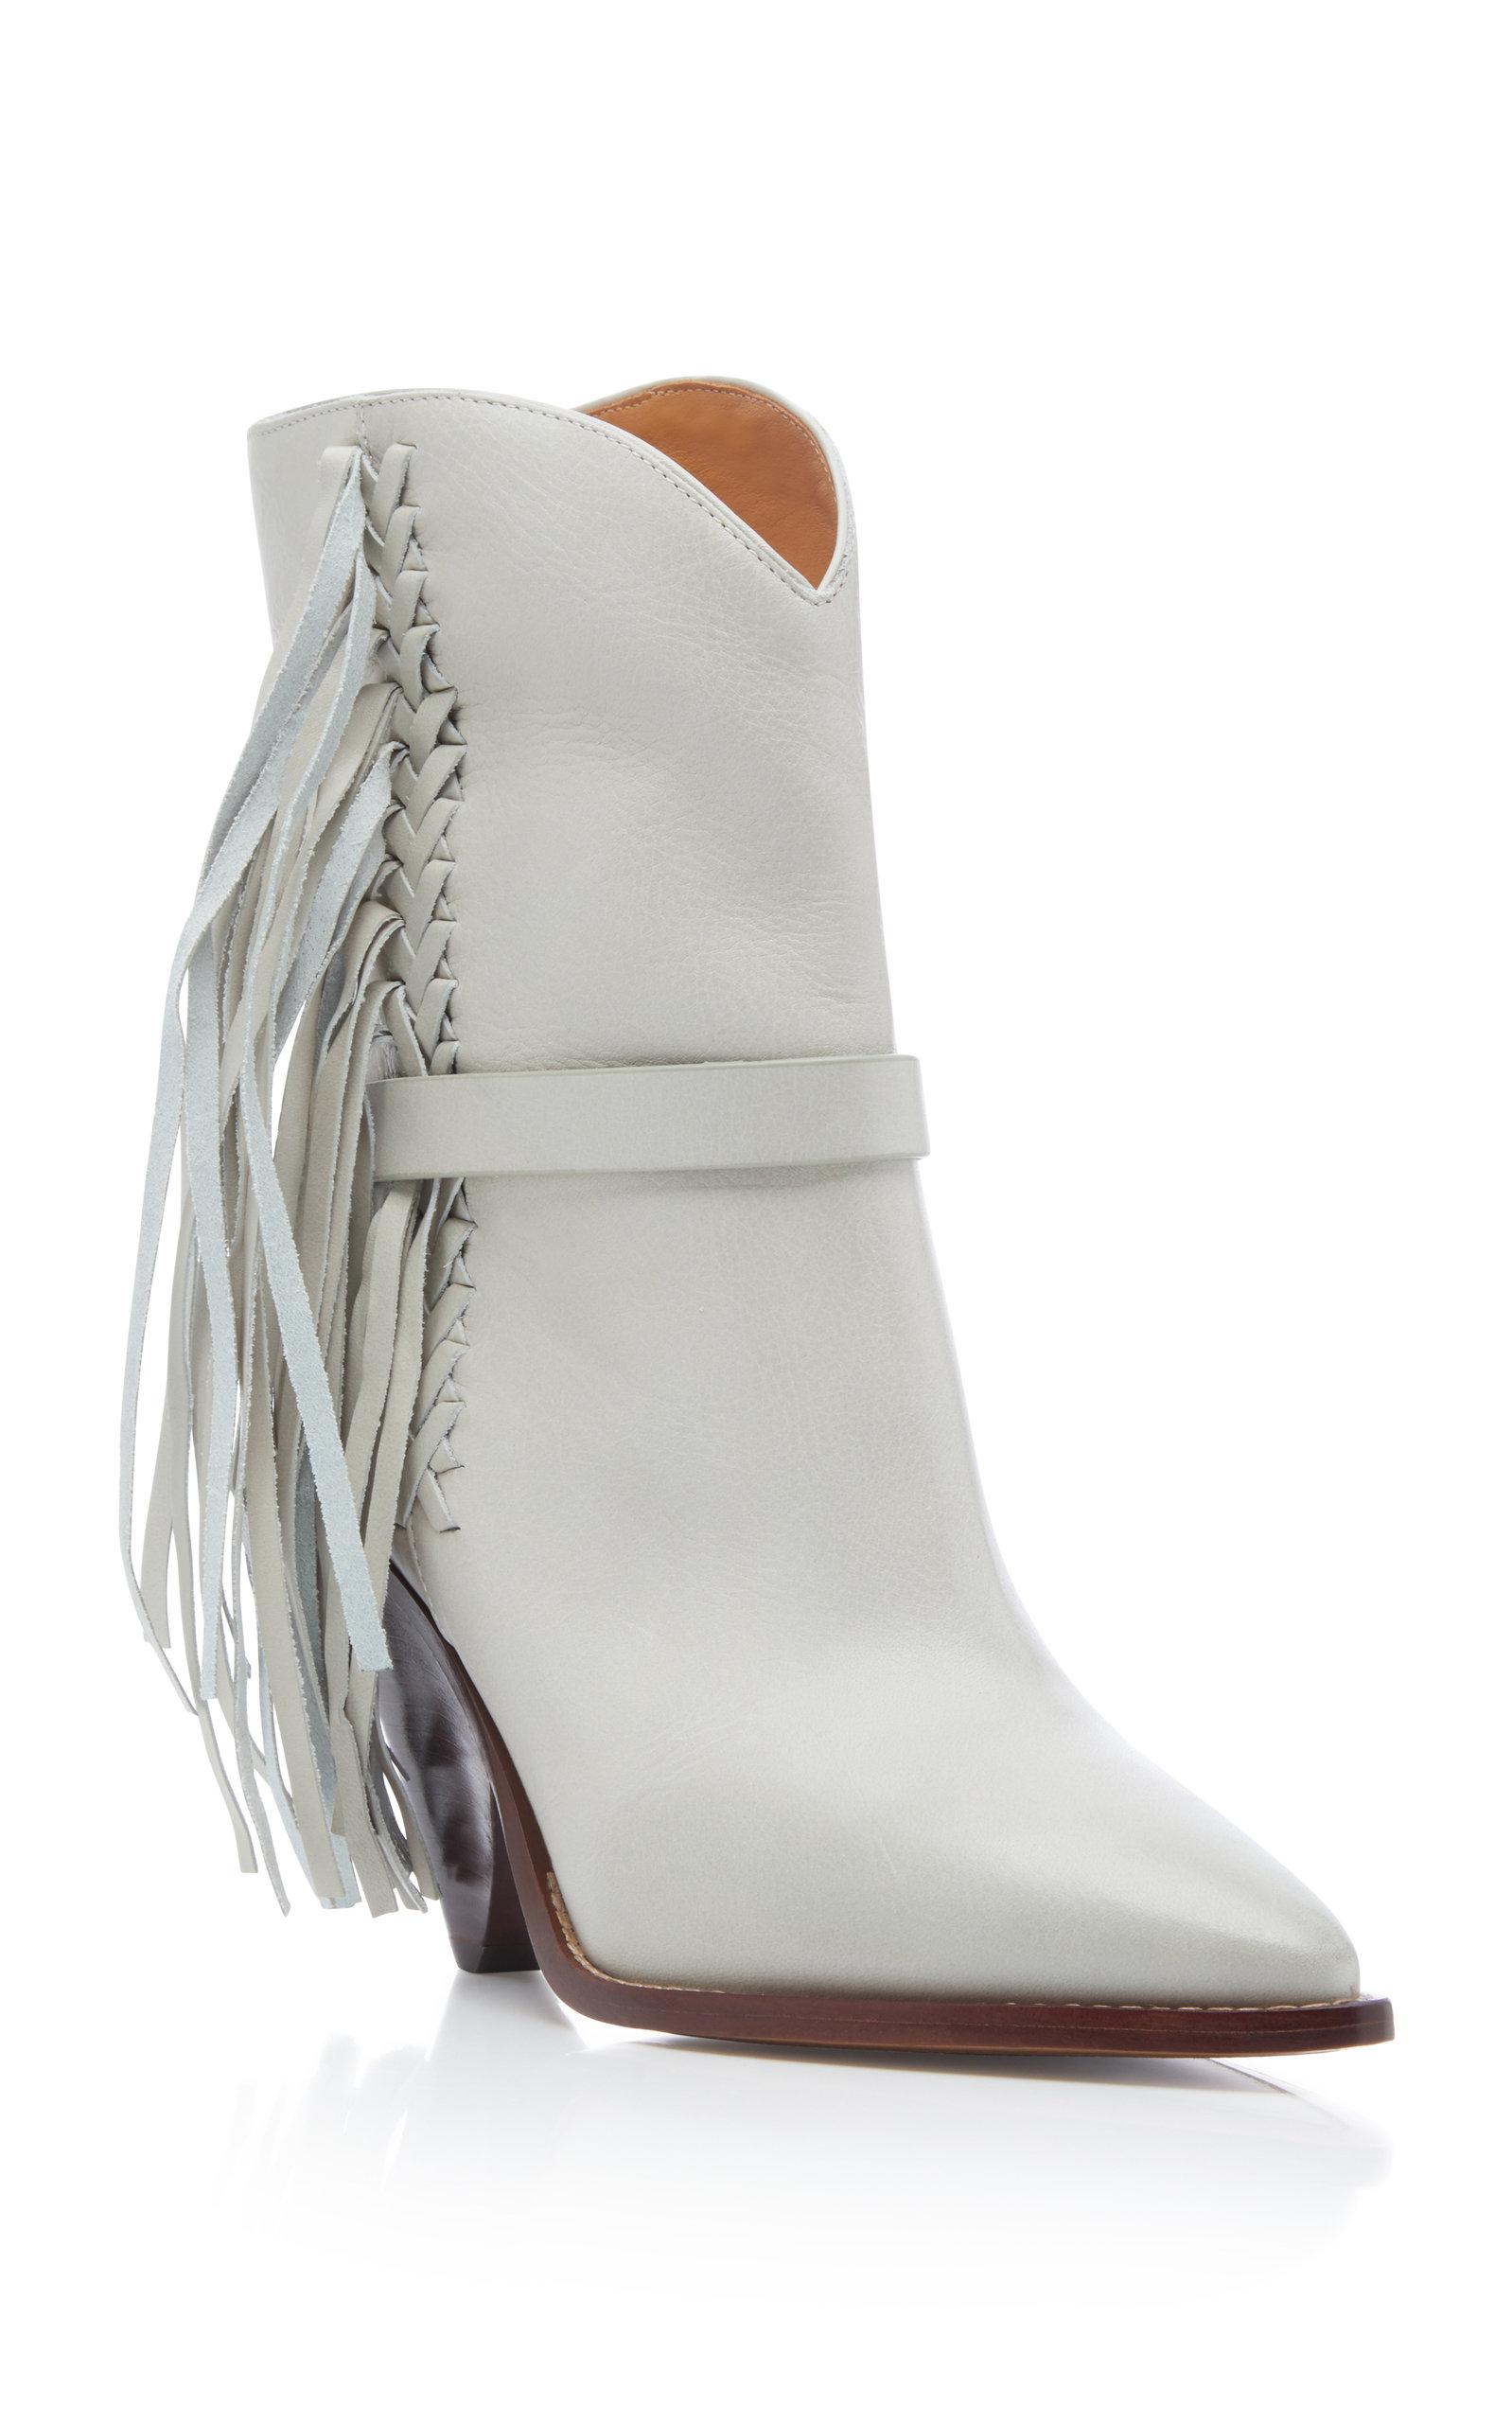 62f78050dcf Isabel MarantLoffen Tasseled Leather Ankle Boots. CLOSE. Loading. Loading.  Loading. Loading